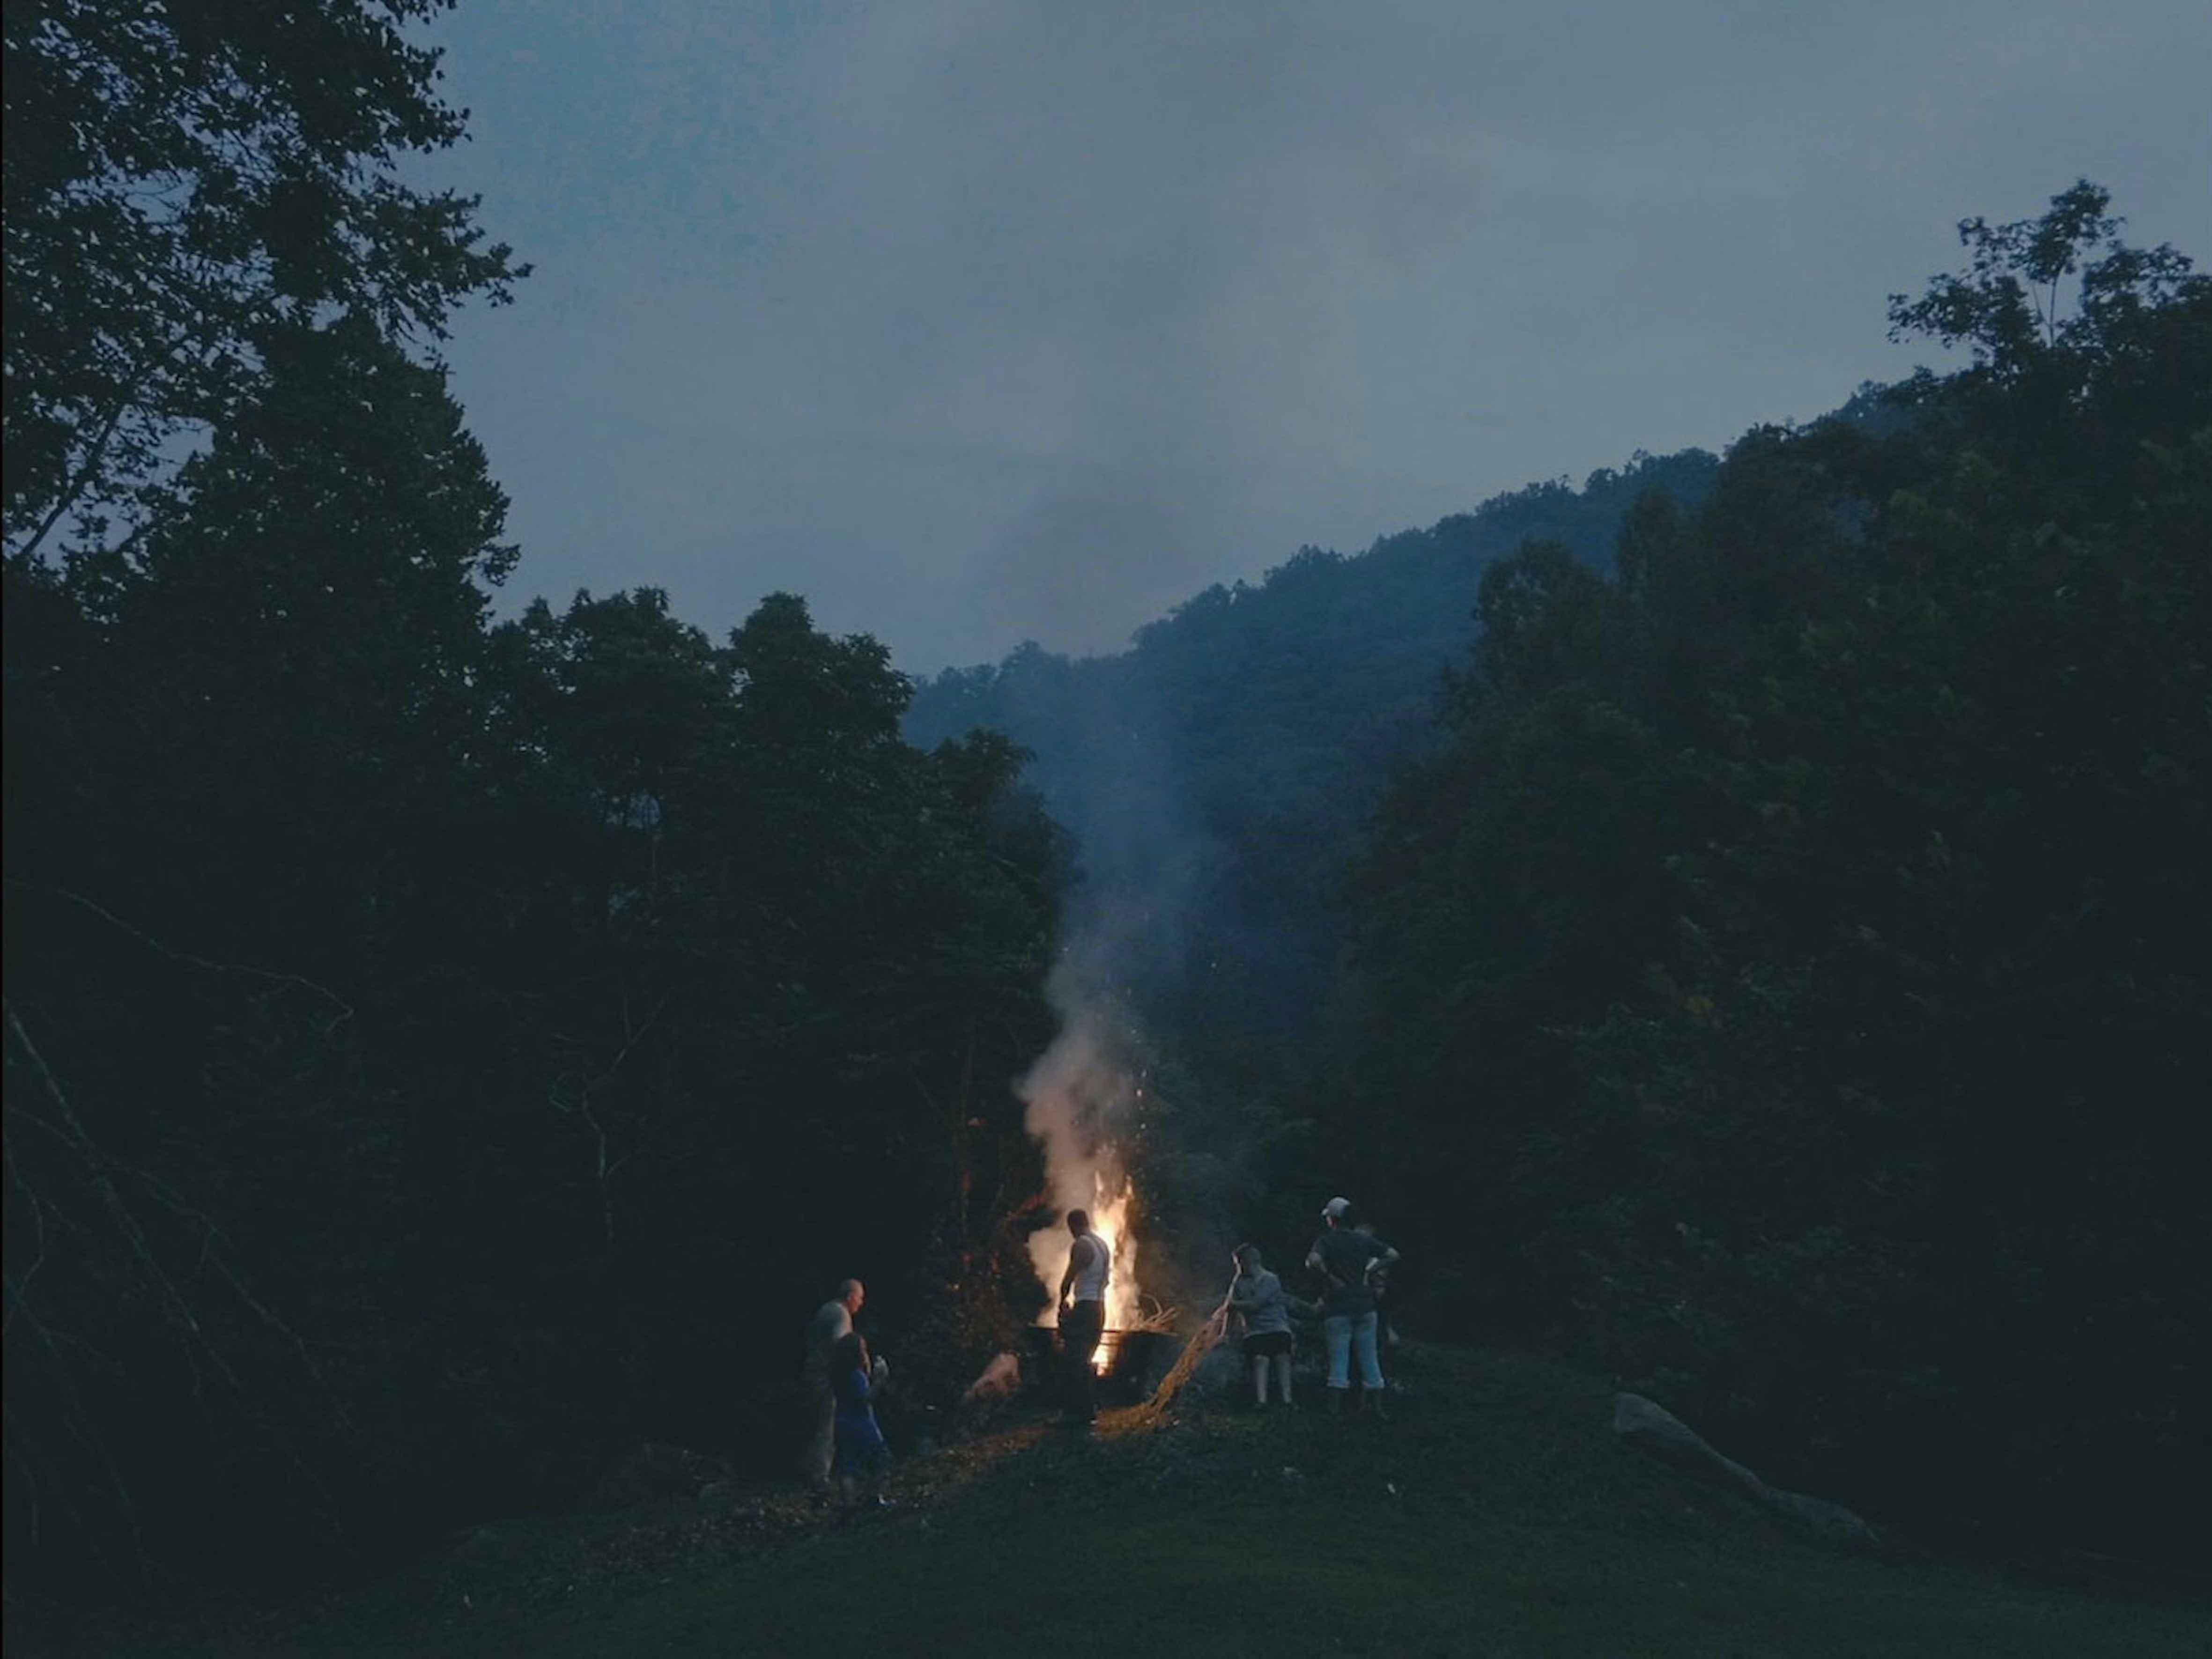 The Last Hillbilly recensione film documentario di Diane Sara Bouzgarrou e Thomas Jenkoe